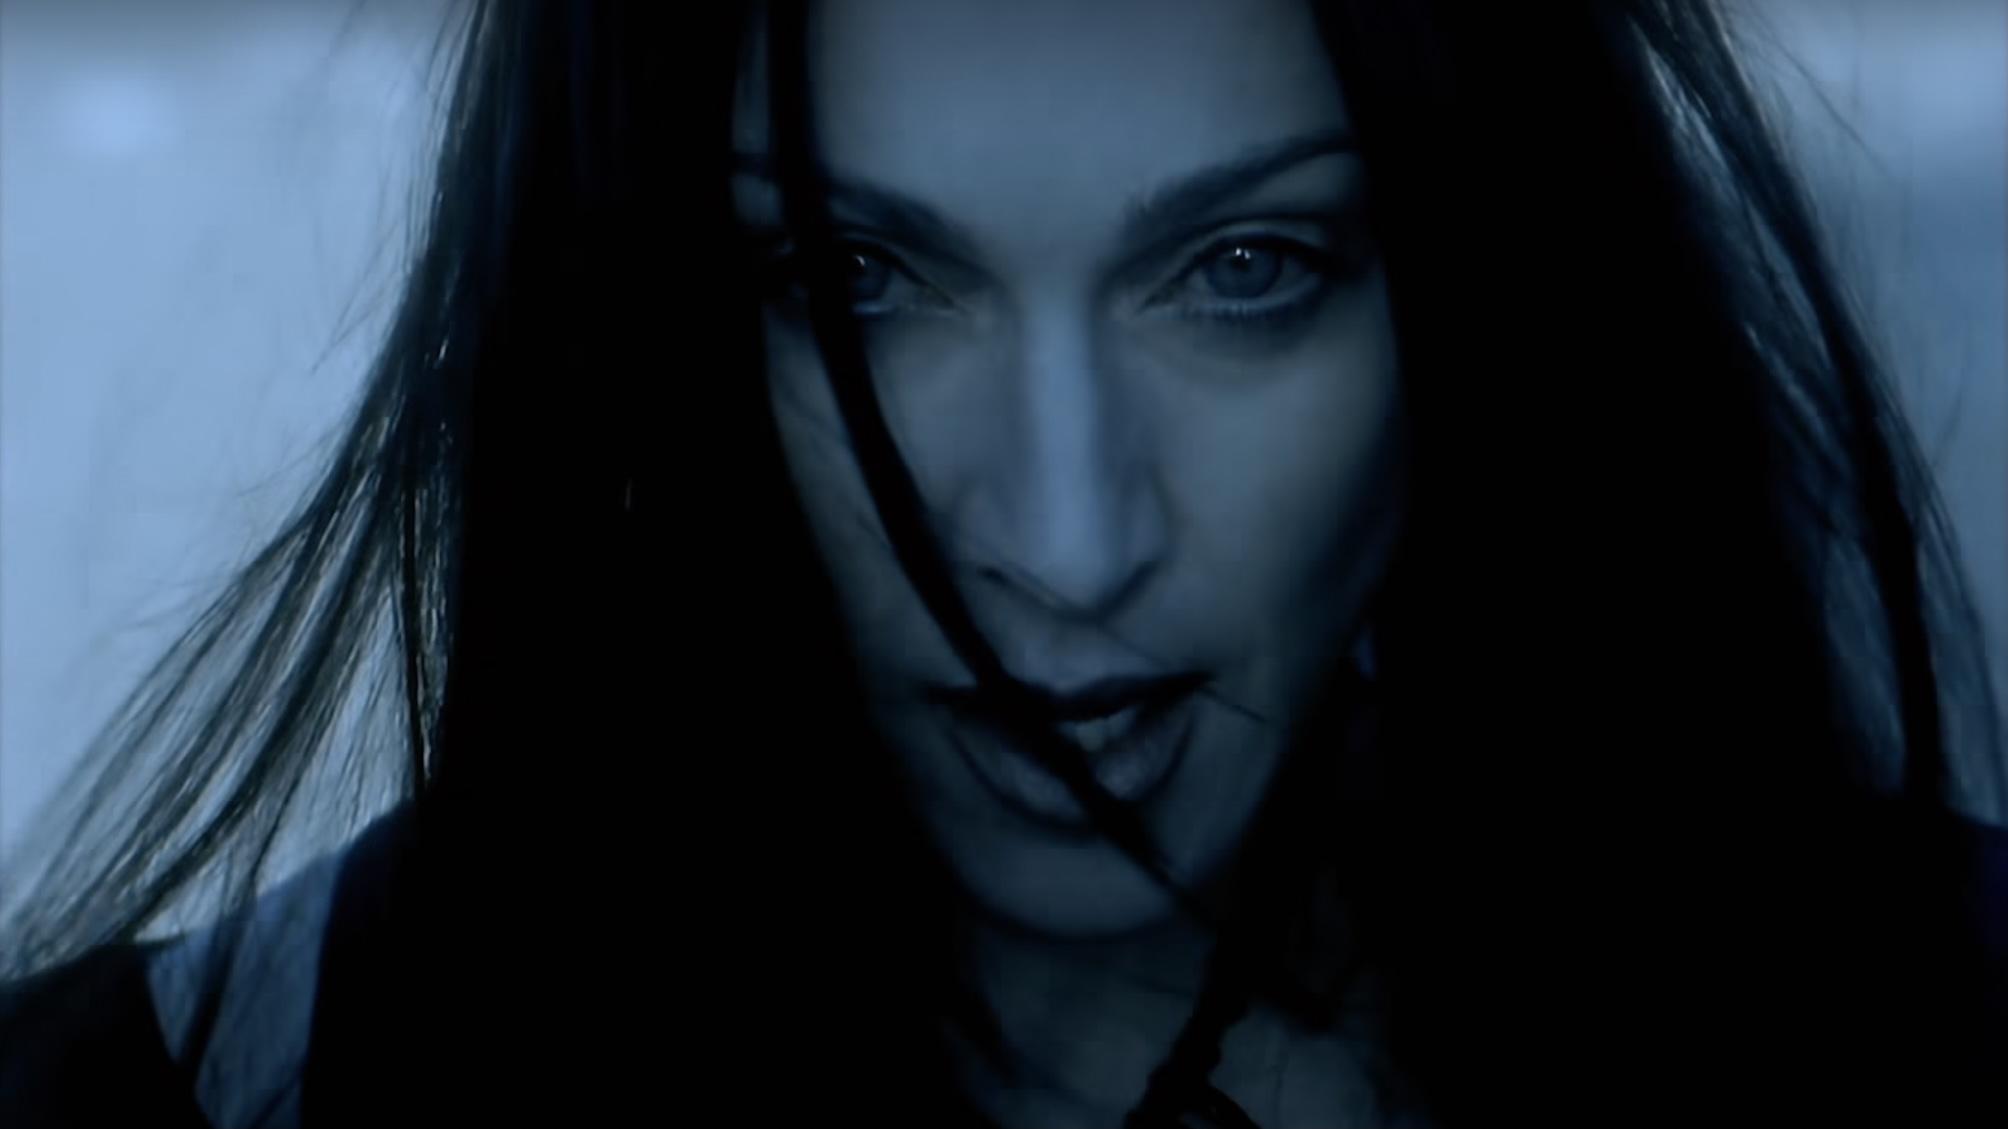 Madonna unleashes 'Frozen' maxi-single on streaming - Retro Pop